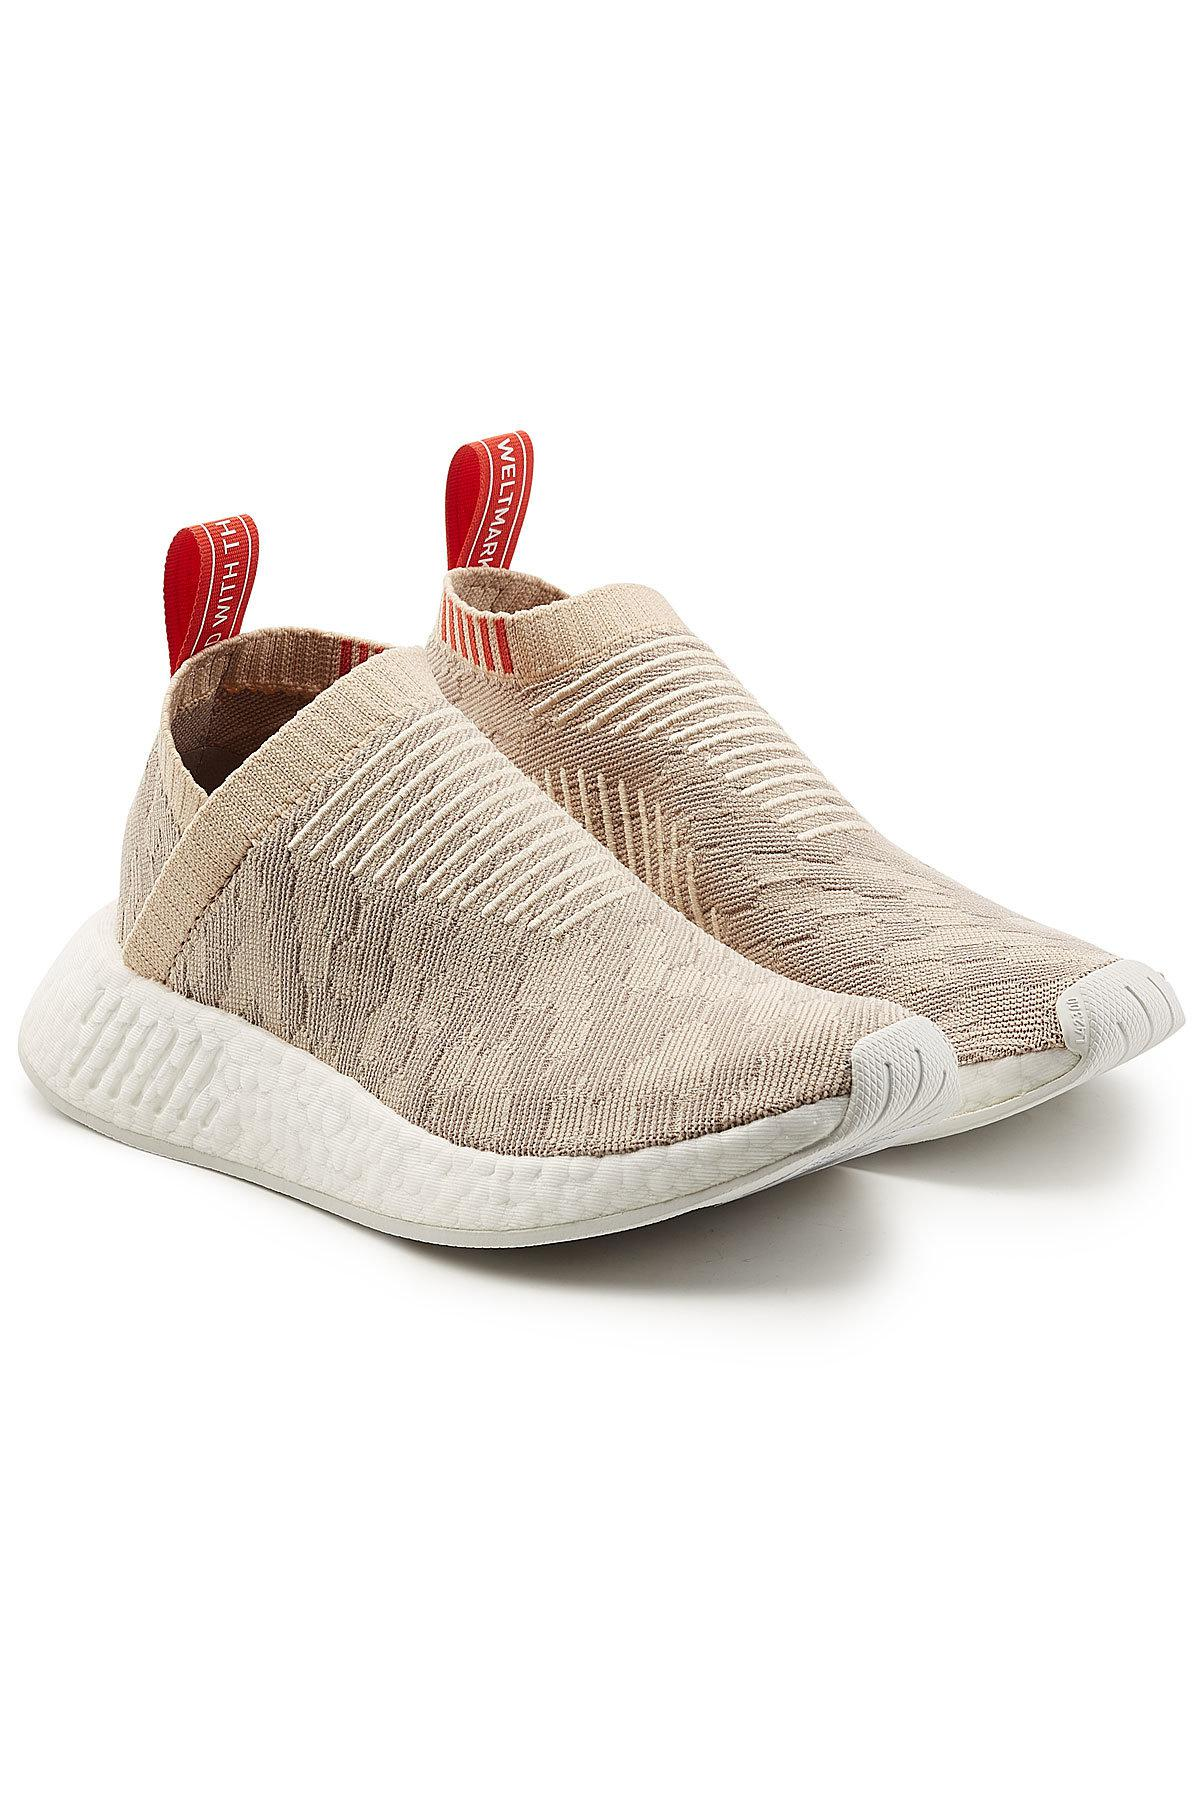 lyst adidas originali nmd cs2 primeknit scarpe